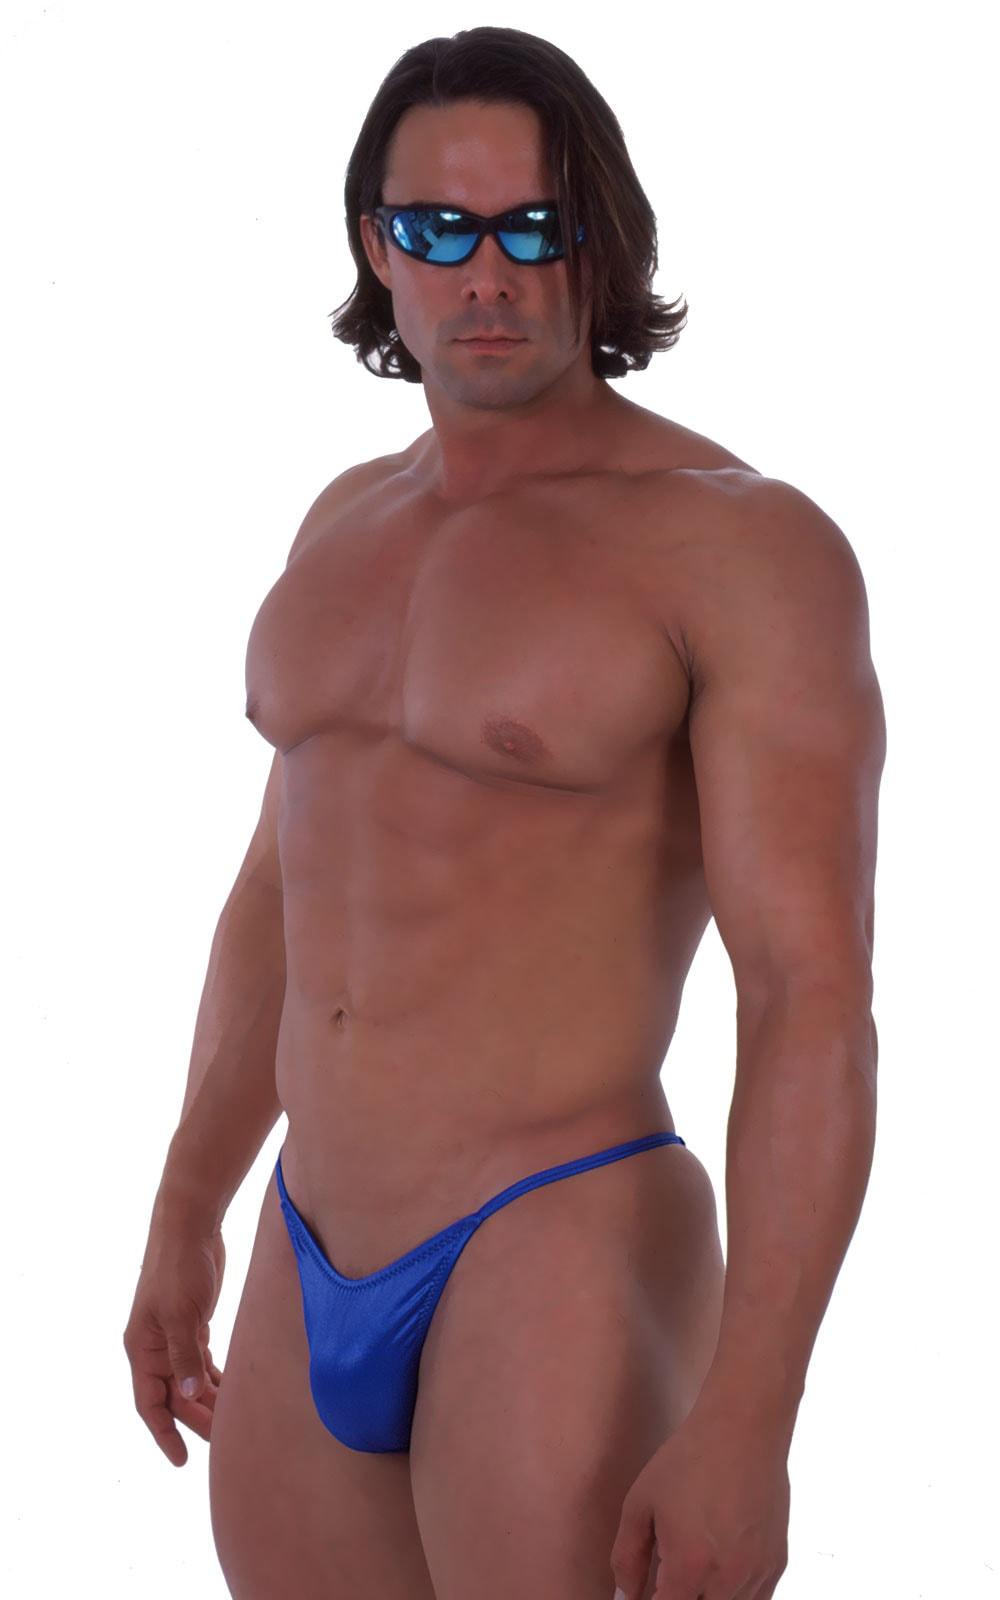 Skinny Side Half Back Swim Suit in Wet Look Royal Blue 3